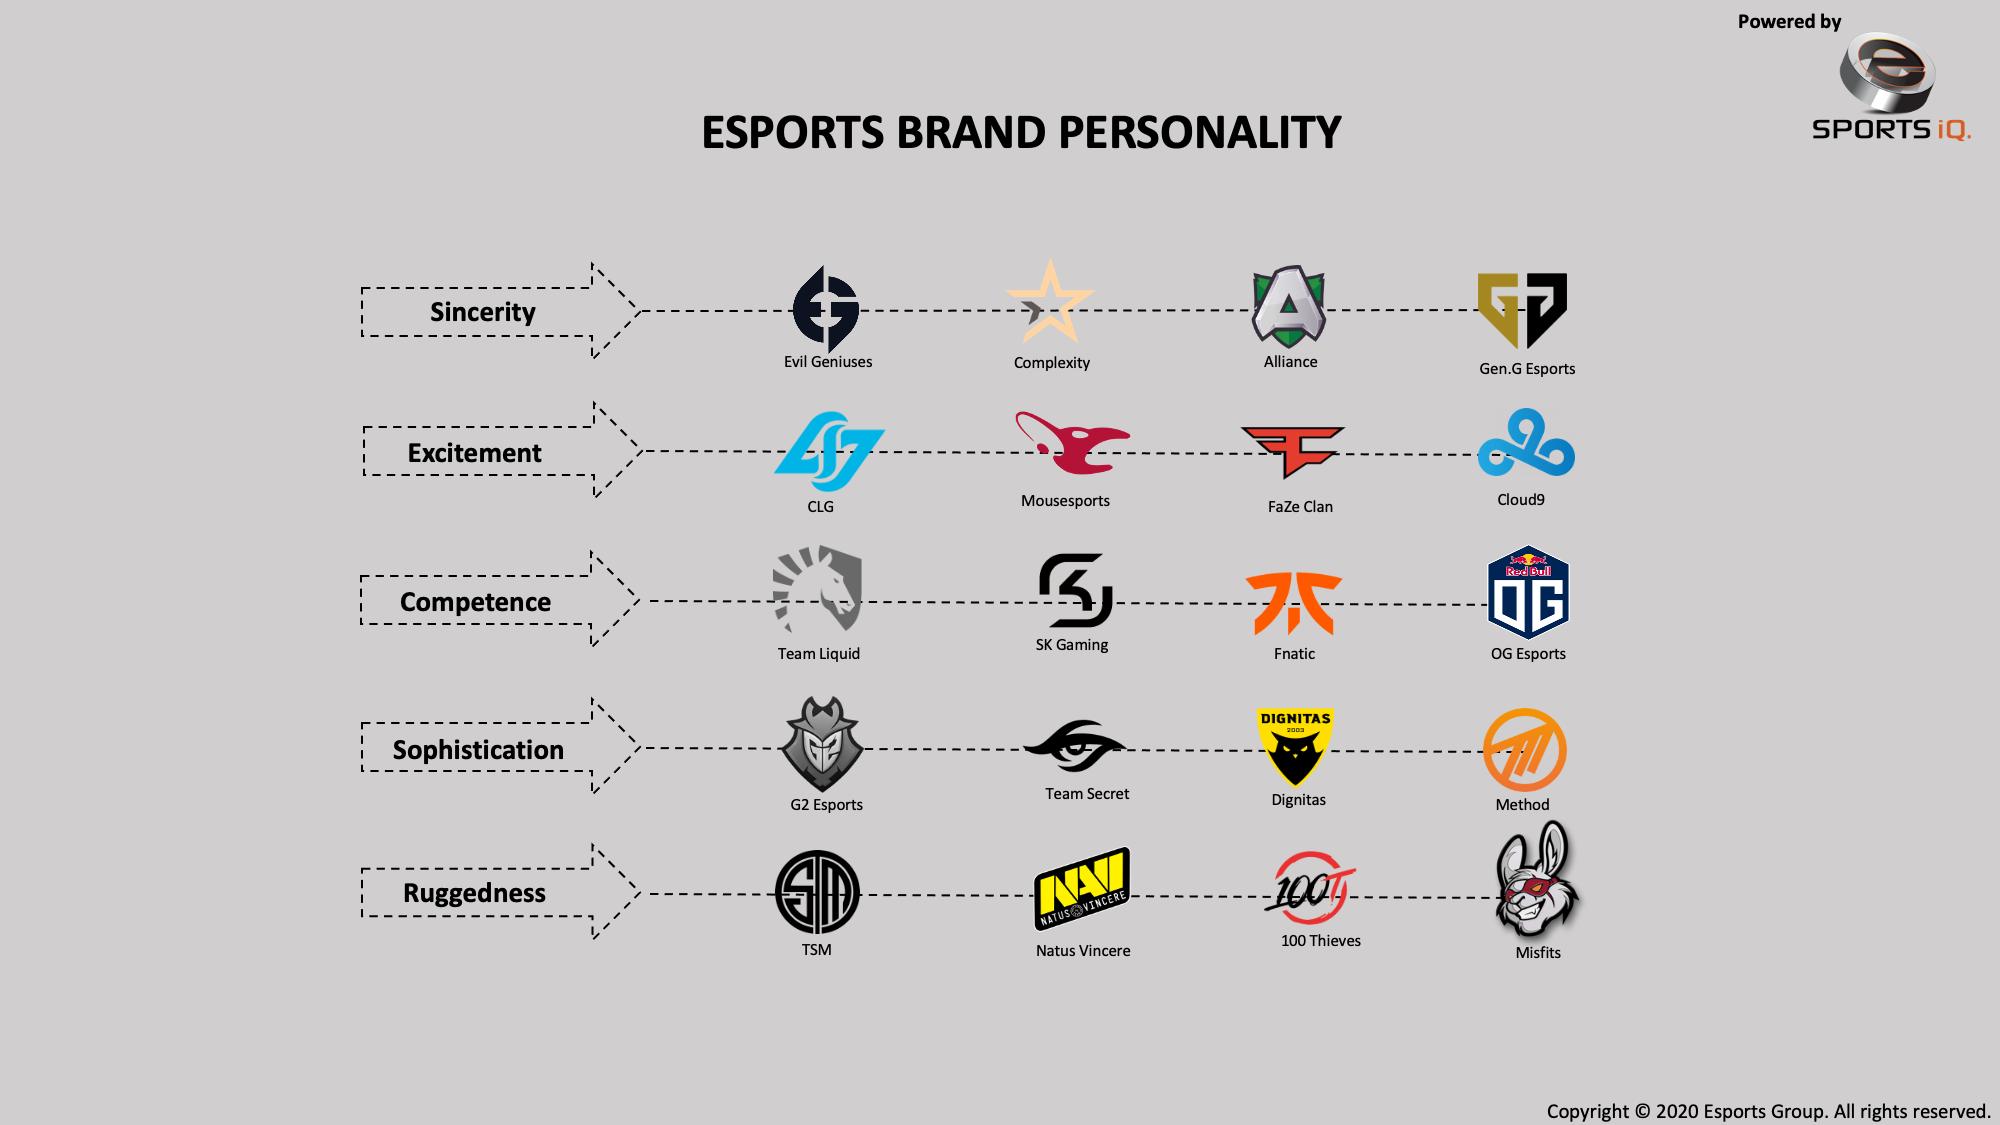 esports brand personality